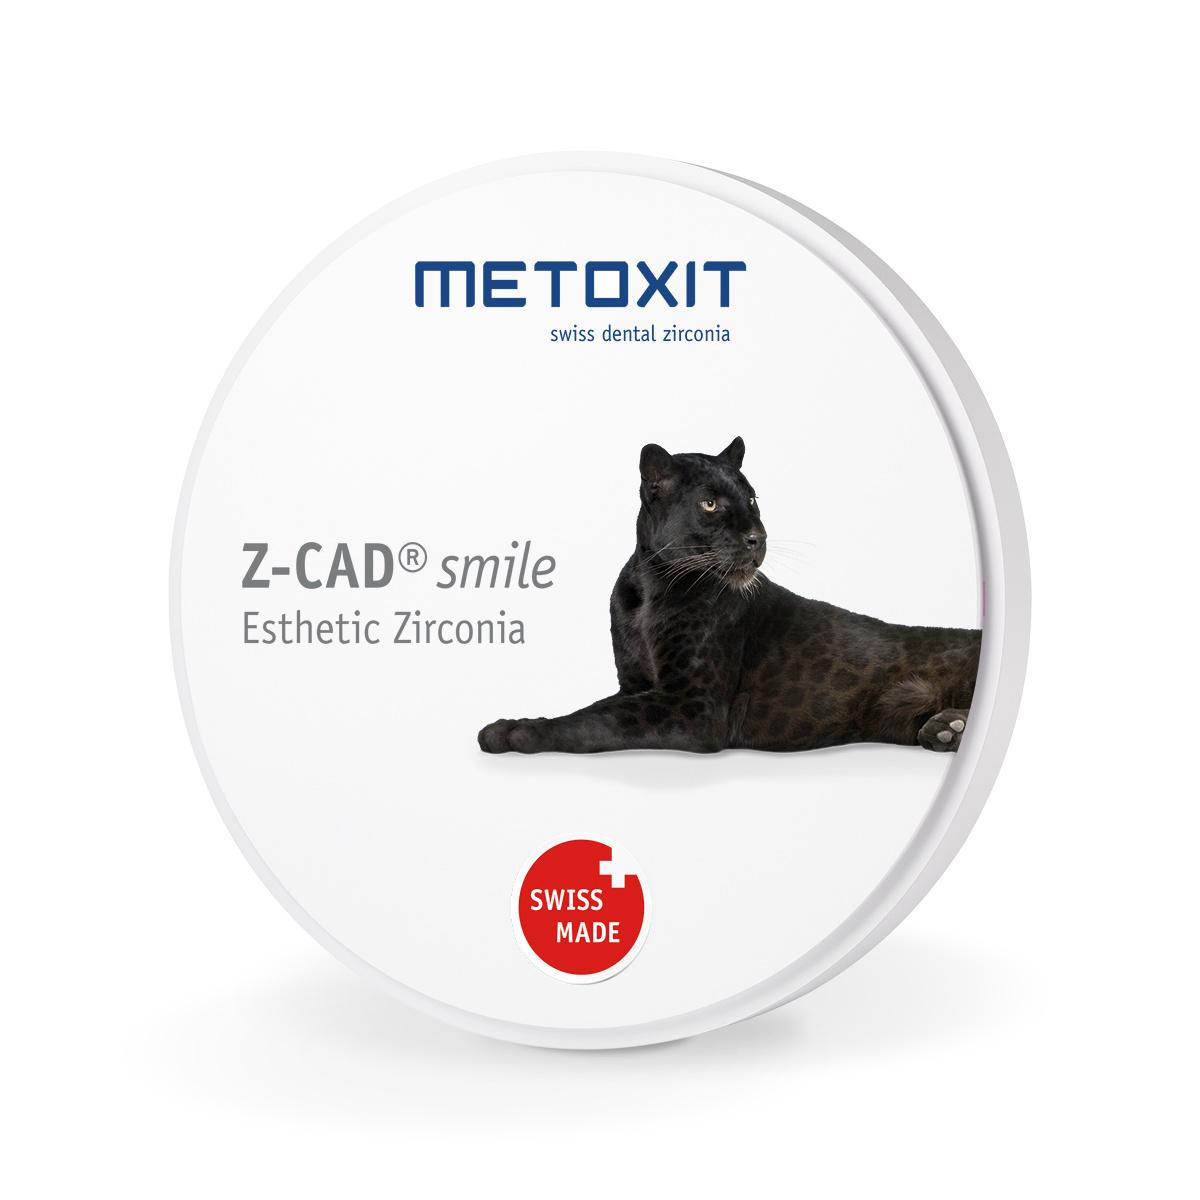 METOXIT Z-CAD® smile - 98.5x10mm